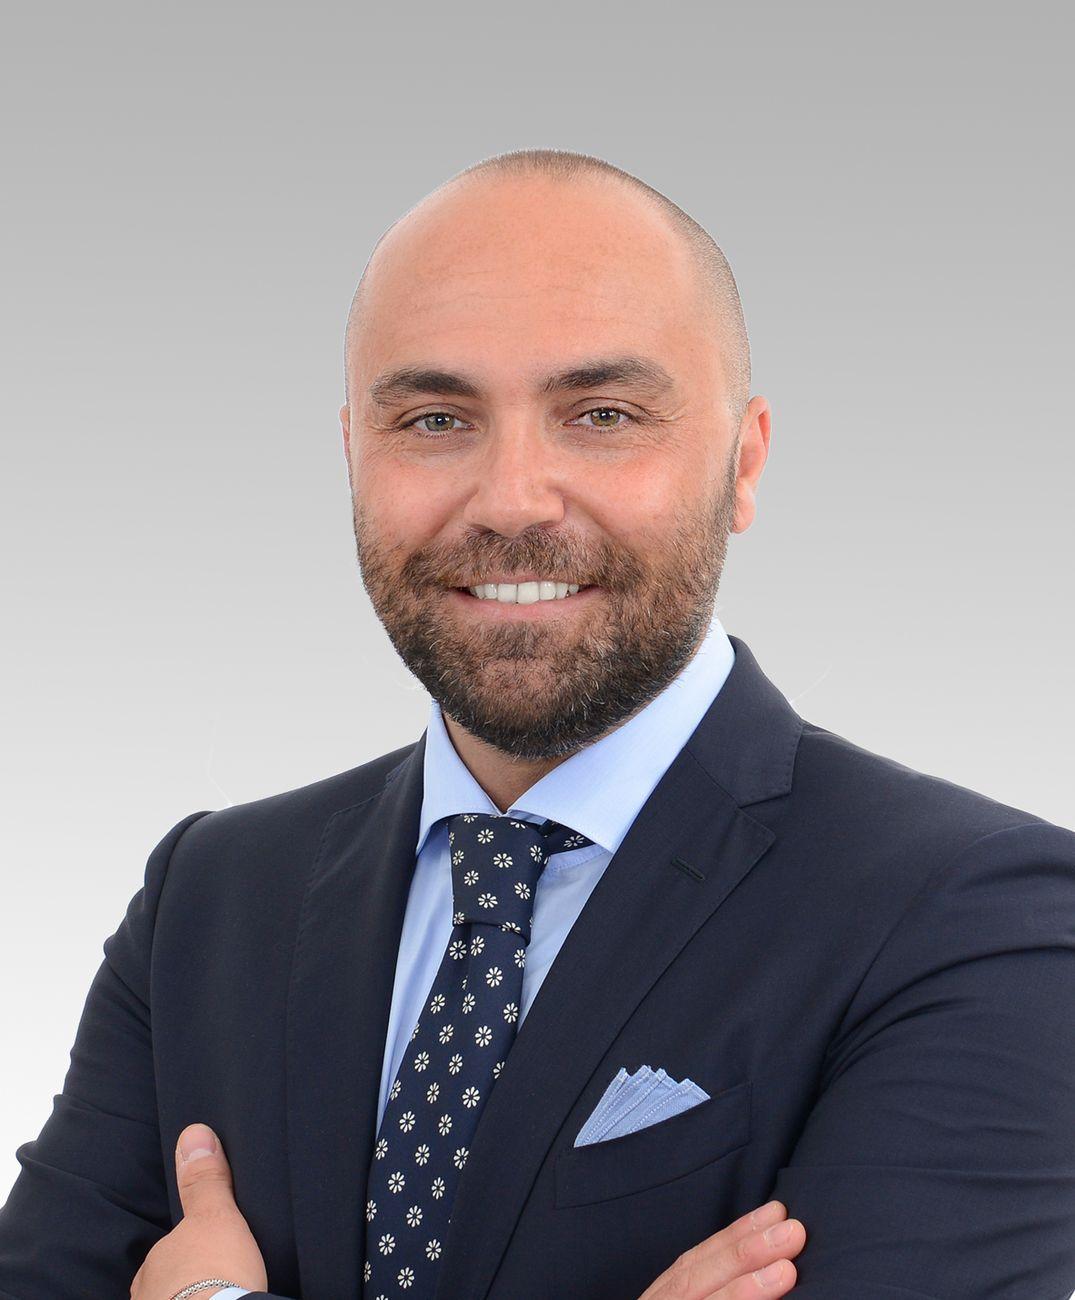 Pablo Carrara, presidente di Meeting Art